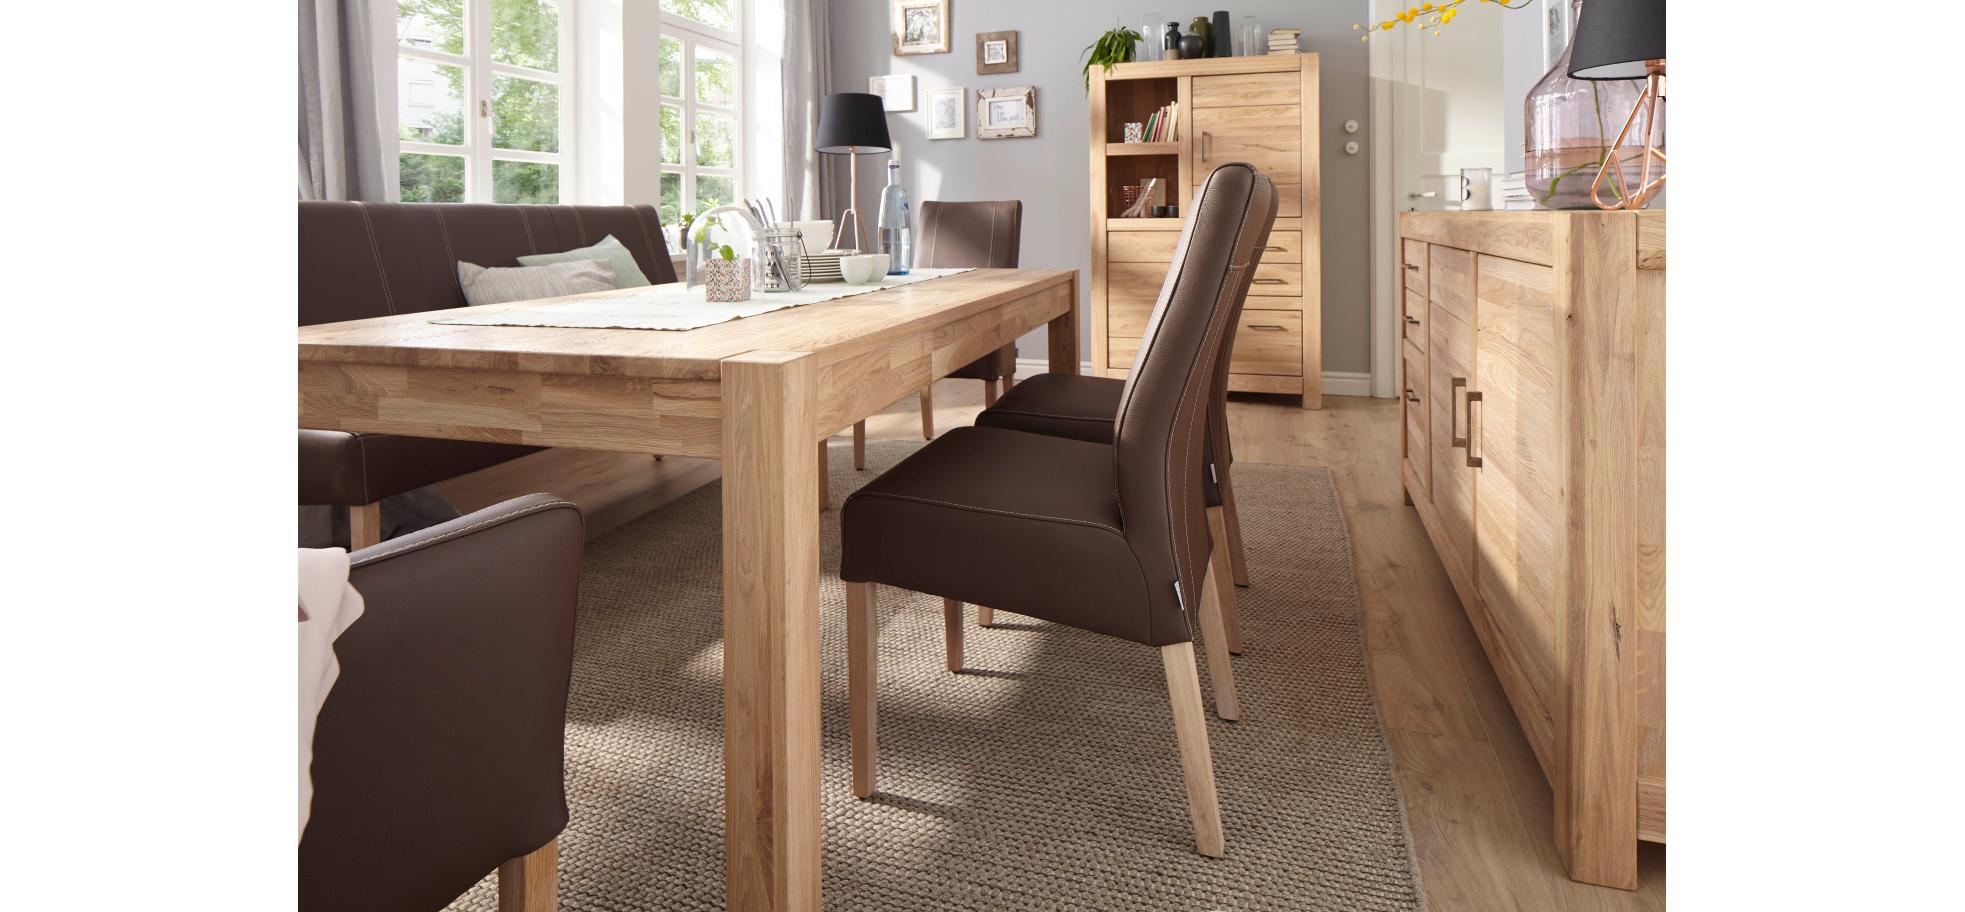 armlehn lederstuhl in espresso und f en in eiche bianco natura utah m belhaus pohl. Black Bedroom Furniture Sets. Home Design Ideas